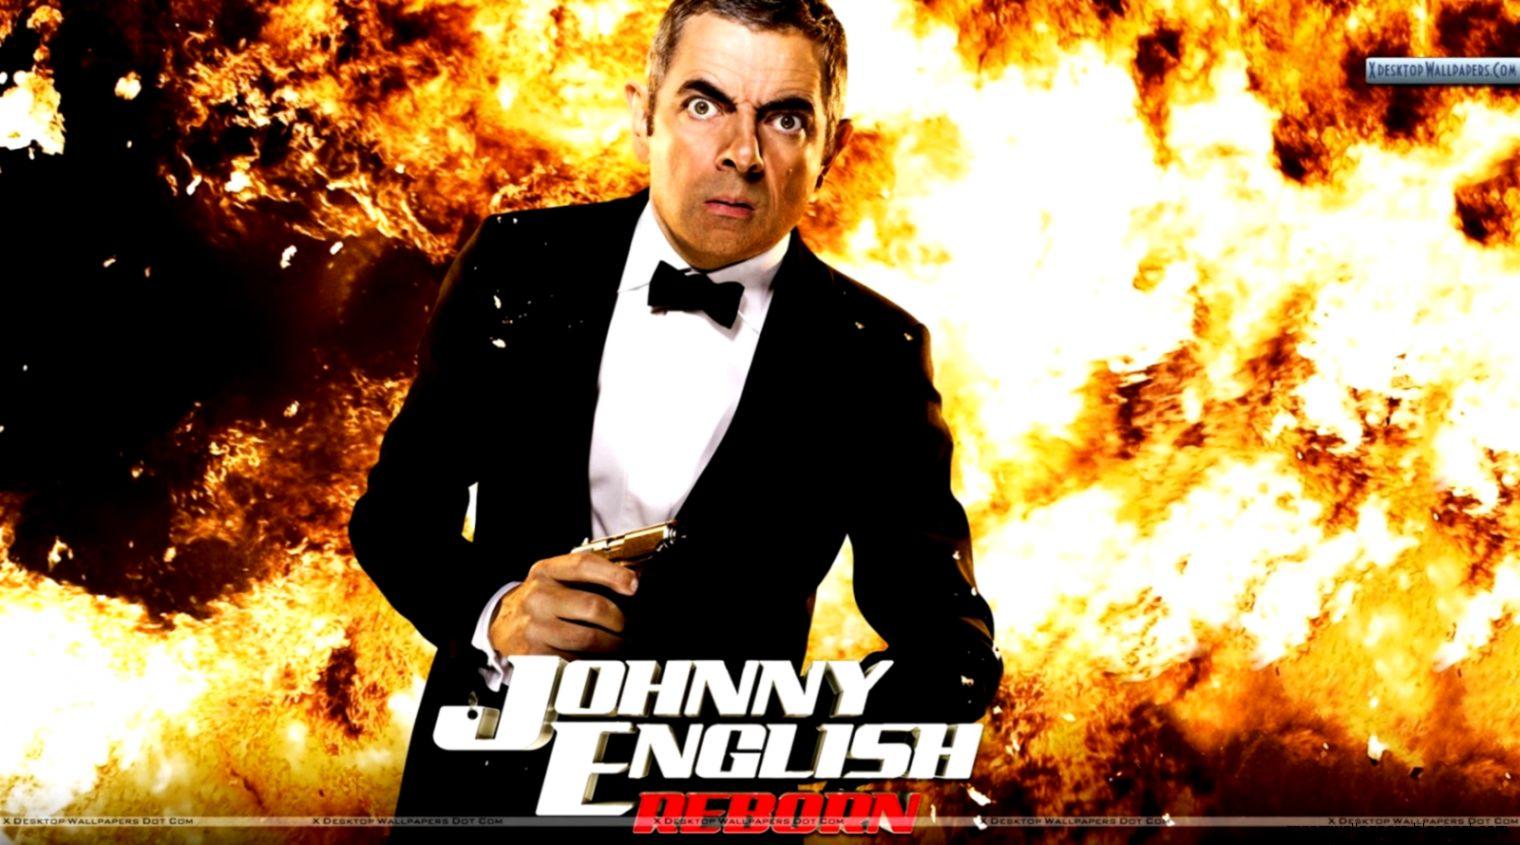 Johnny English Reborn Rowan Atkinson Wallpapers  View Wallpapers